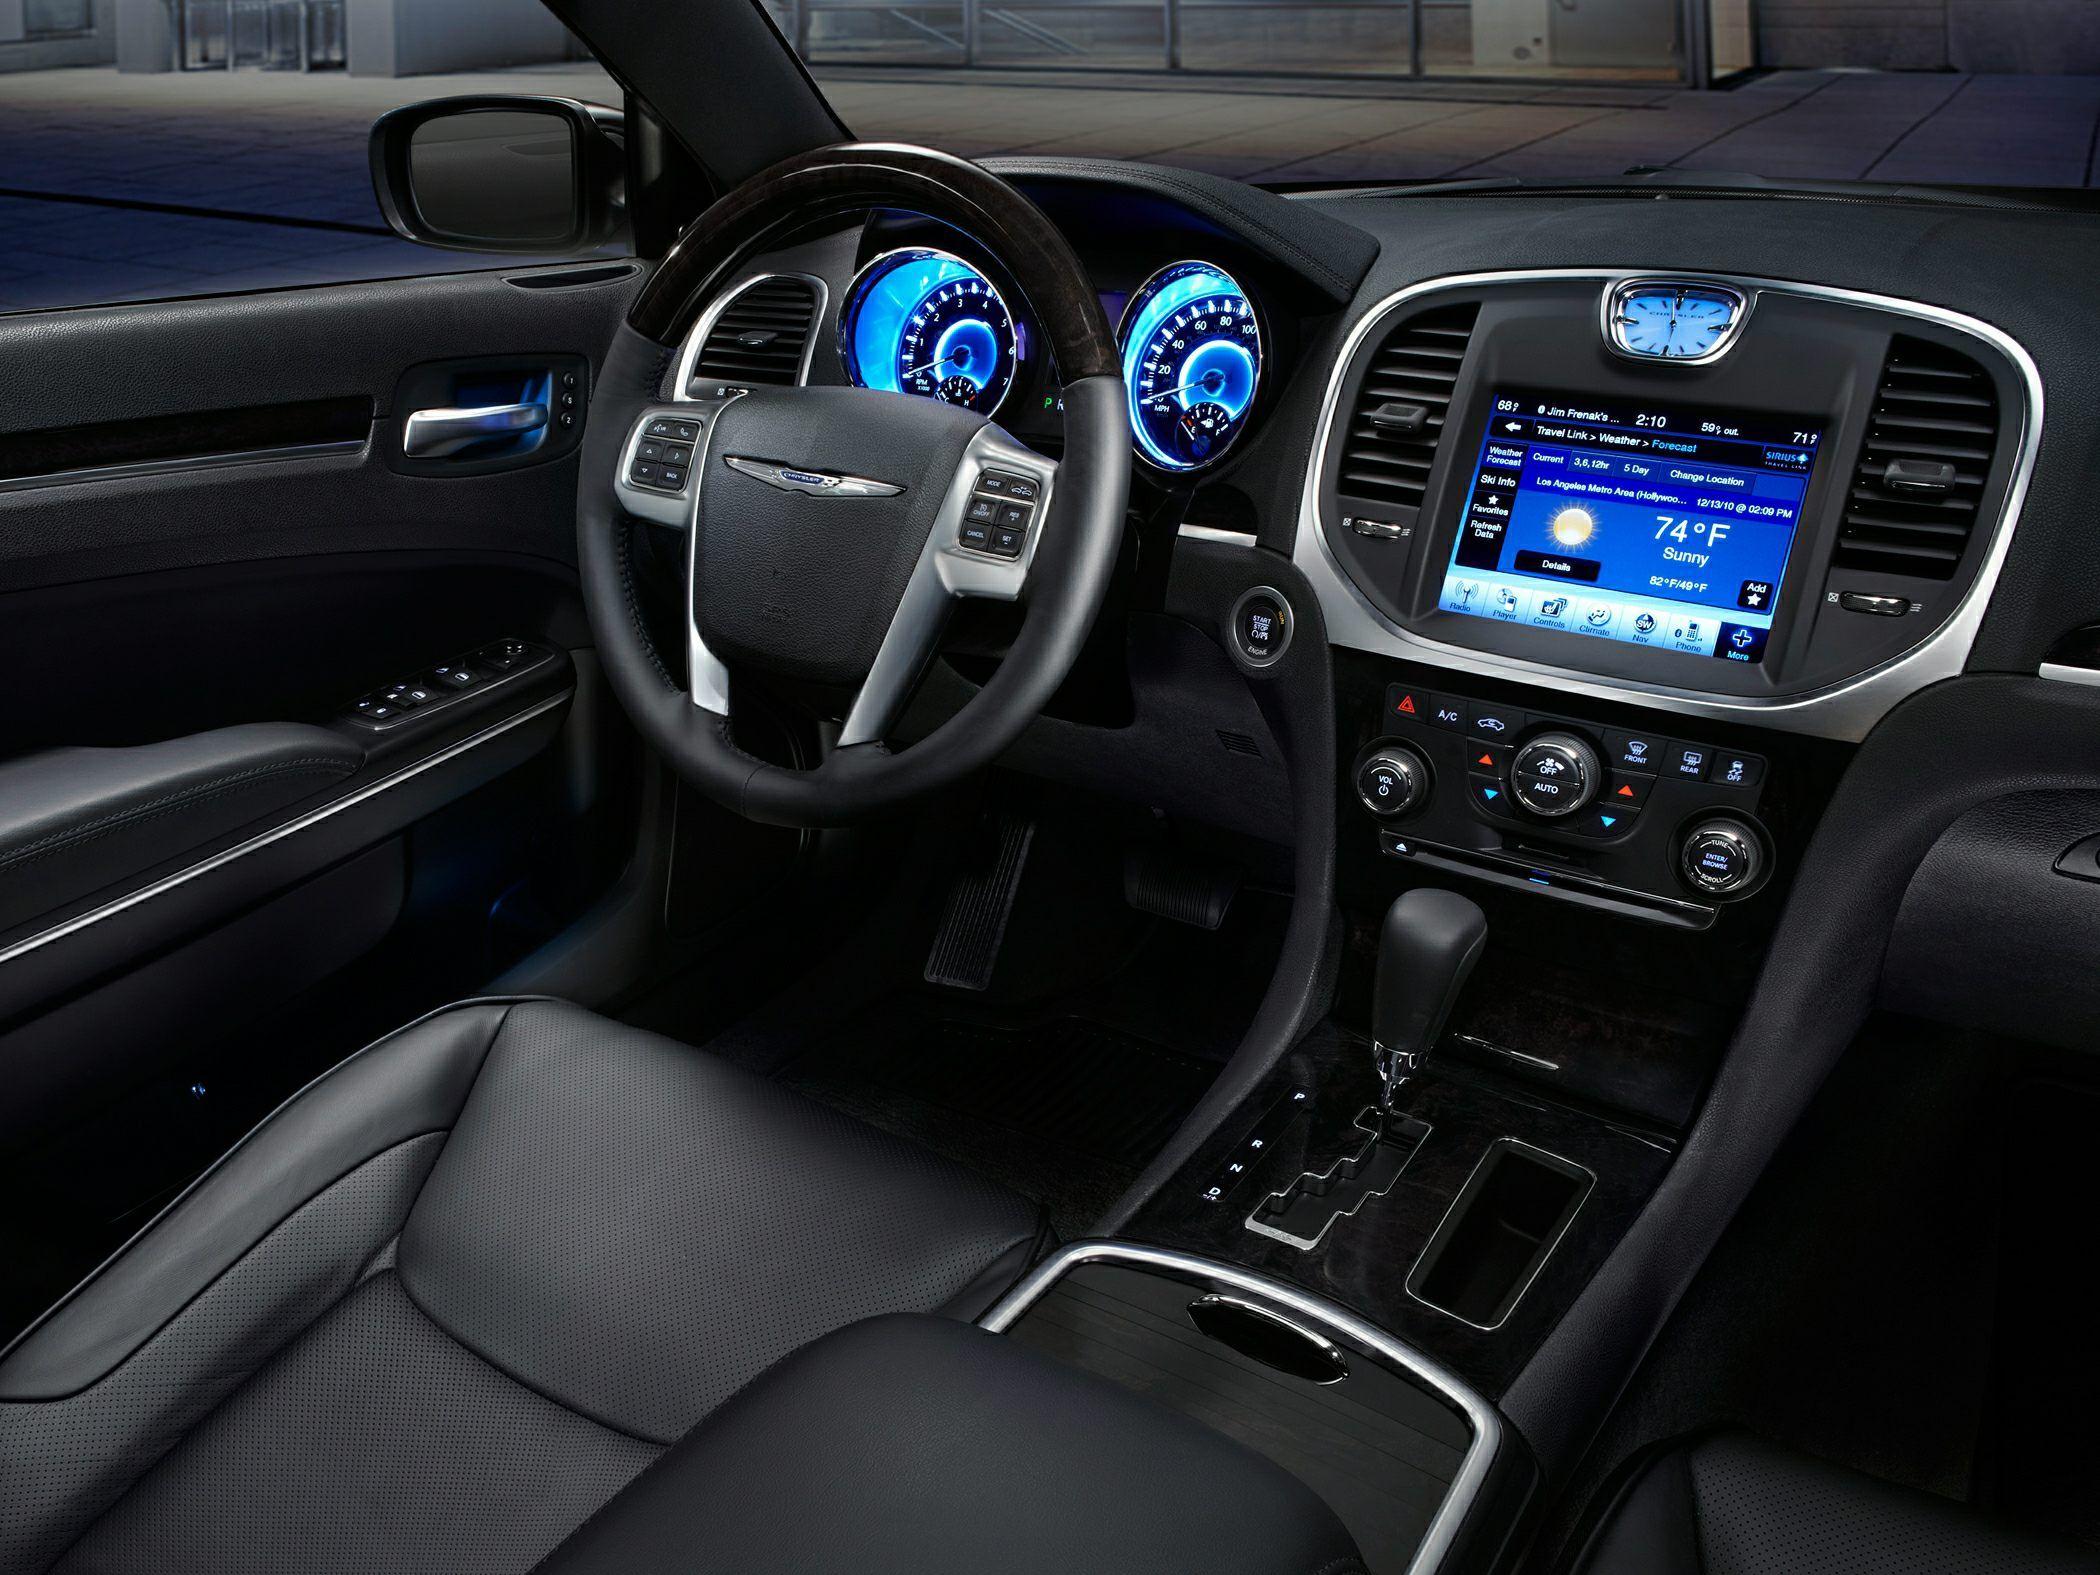 Chrysler Automobile Super Image Browse The 2019 300 Interior